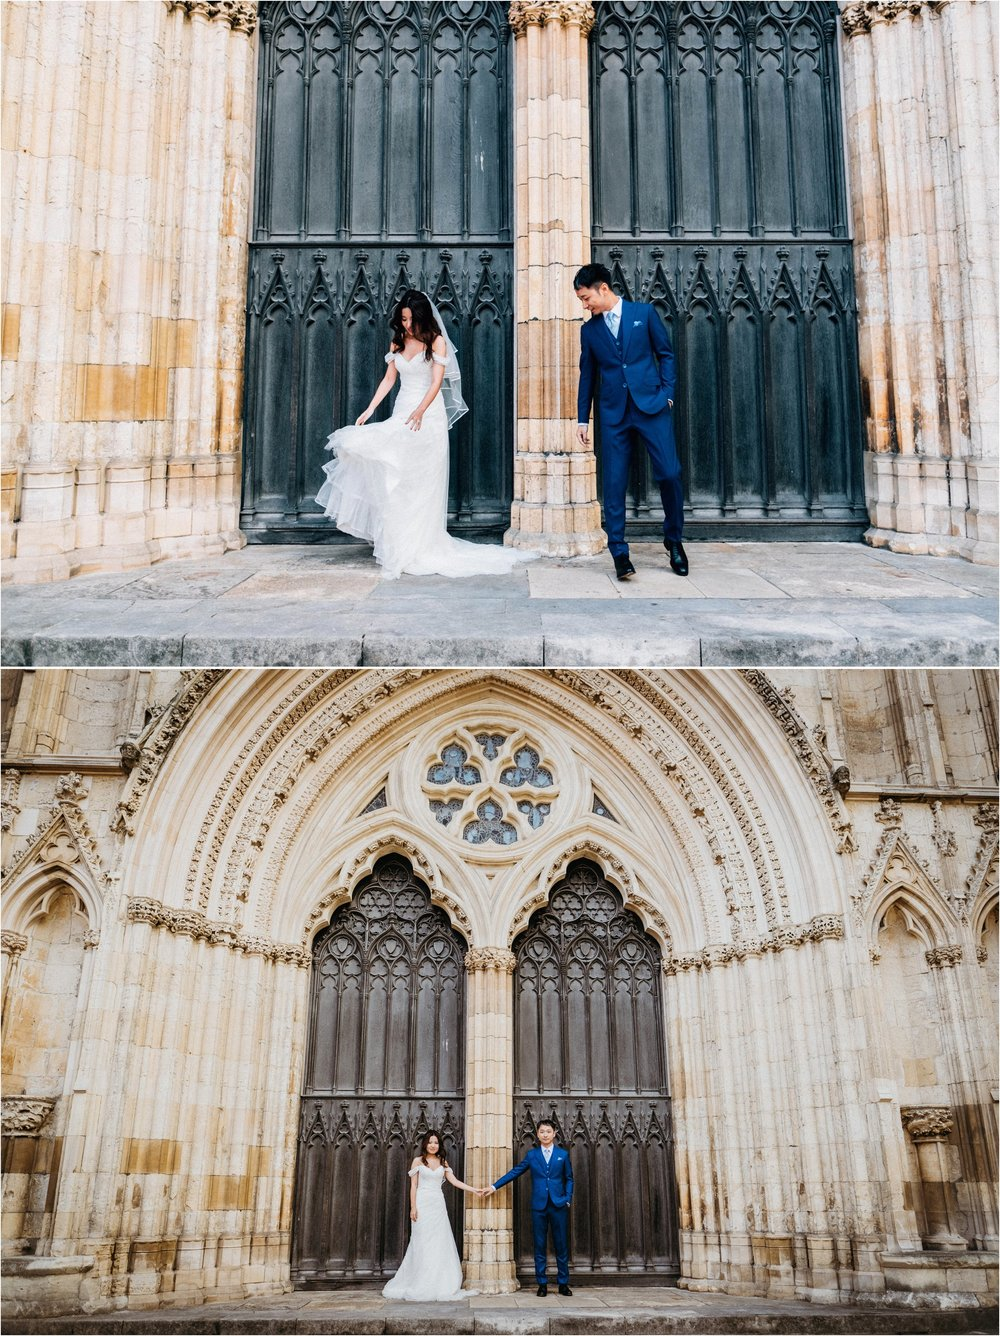 York city elopement wedding photographer_0118.jpg